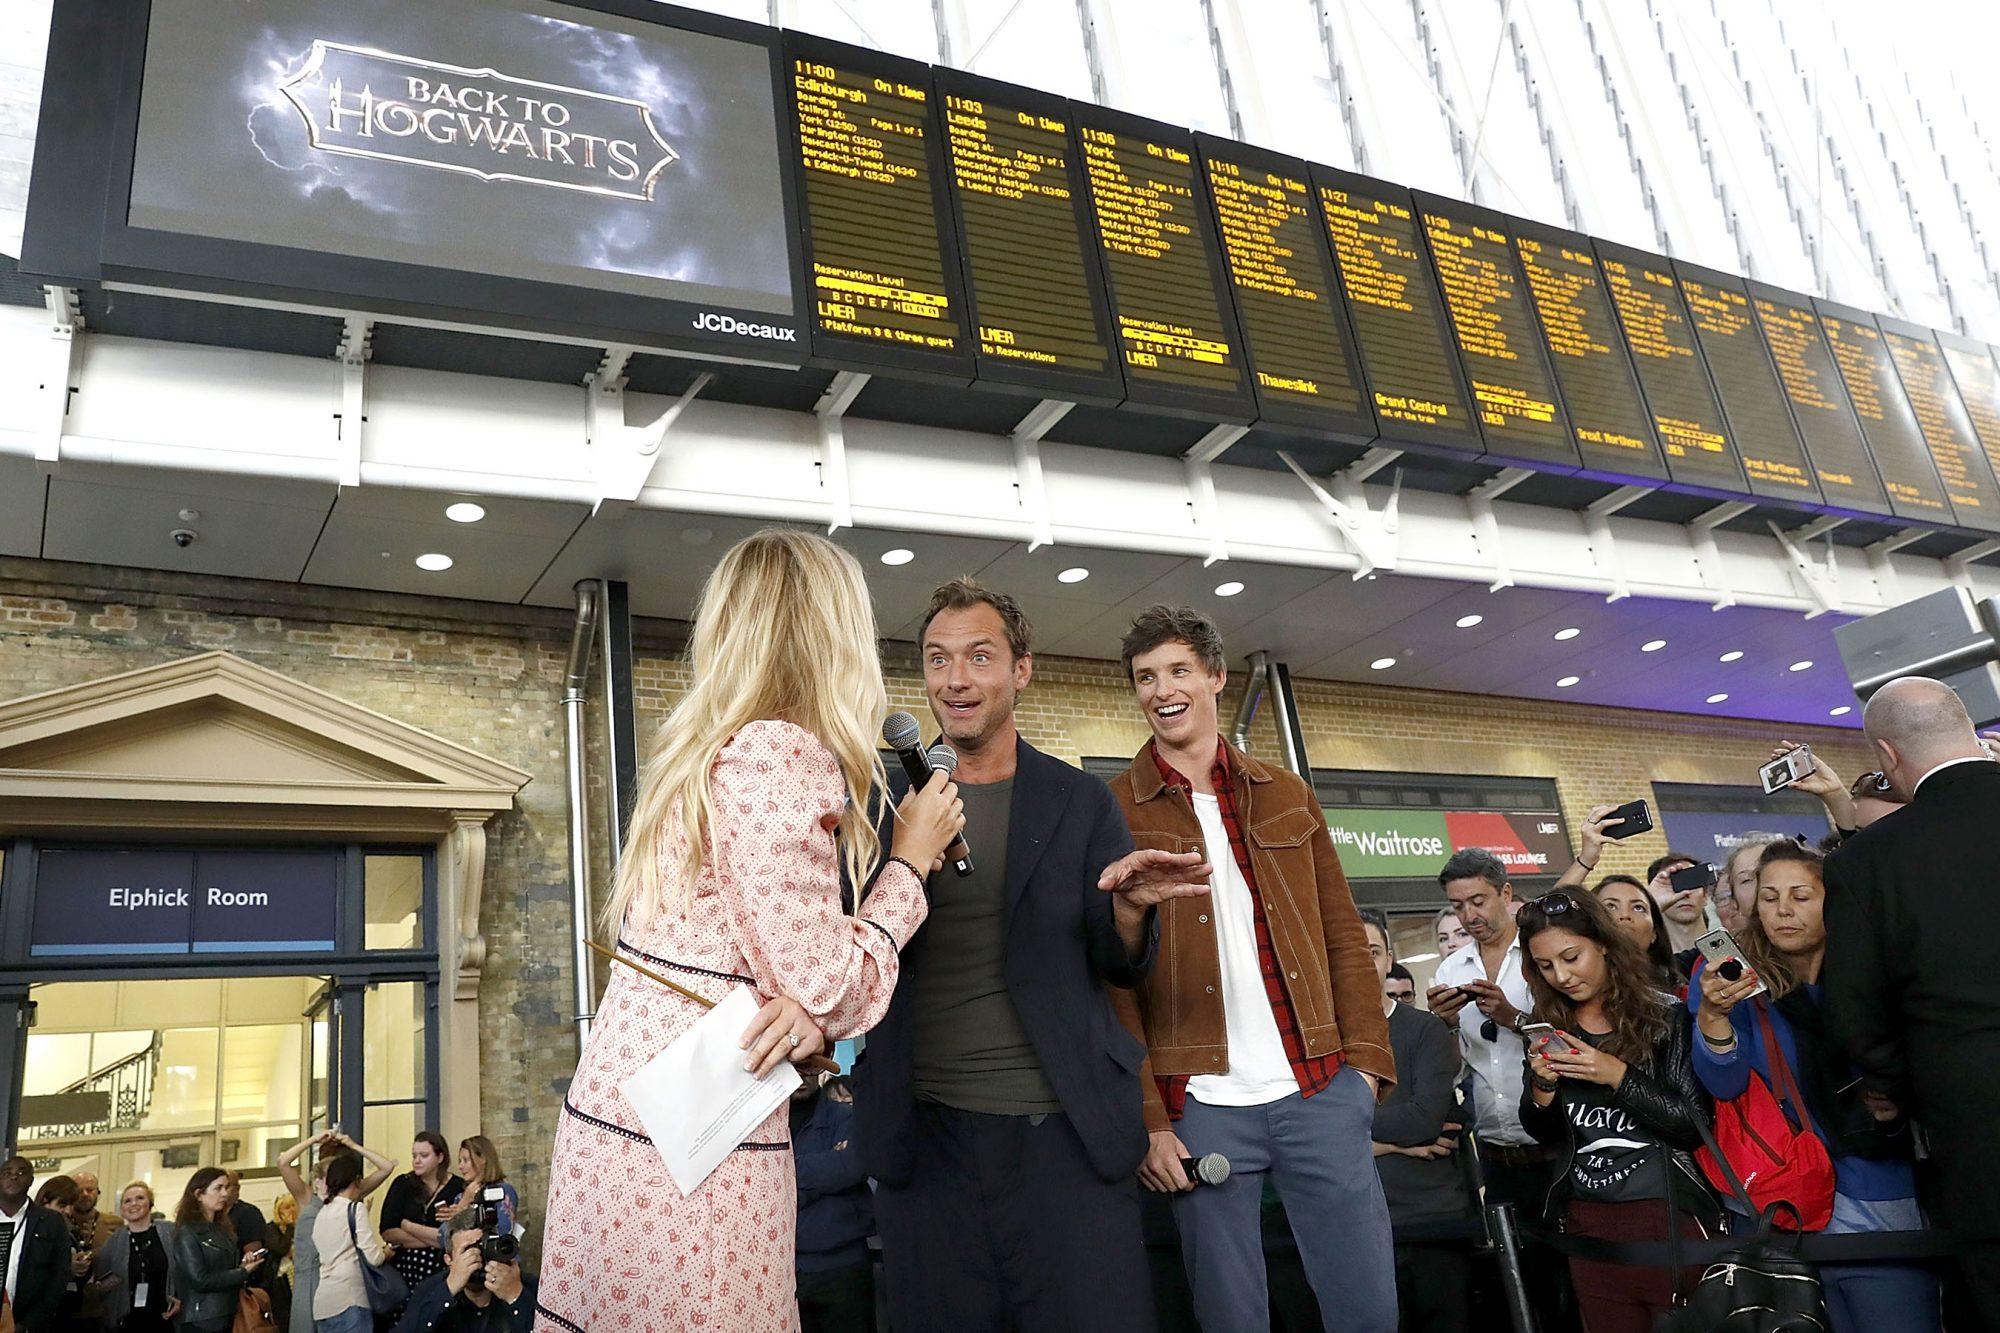 LONDON, ENGLAND - SEPTEMBER 01: Eddie Redmayne (R) and Jude Law (L), stars of Fantastic Beasts: The Crimes Of Grindelwald, surprise fans at platform 9 3/4 during 'Back to Hogwarts' day celebration at Kings Cross Station on September 1, 2018 in London, England.